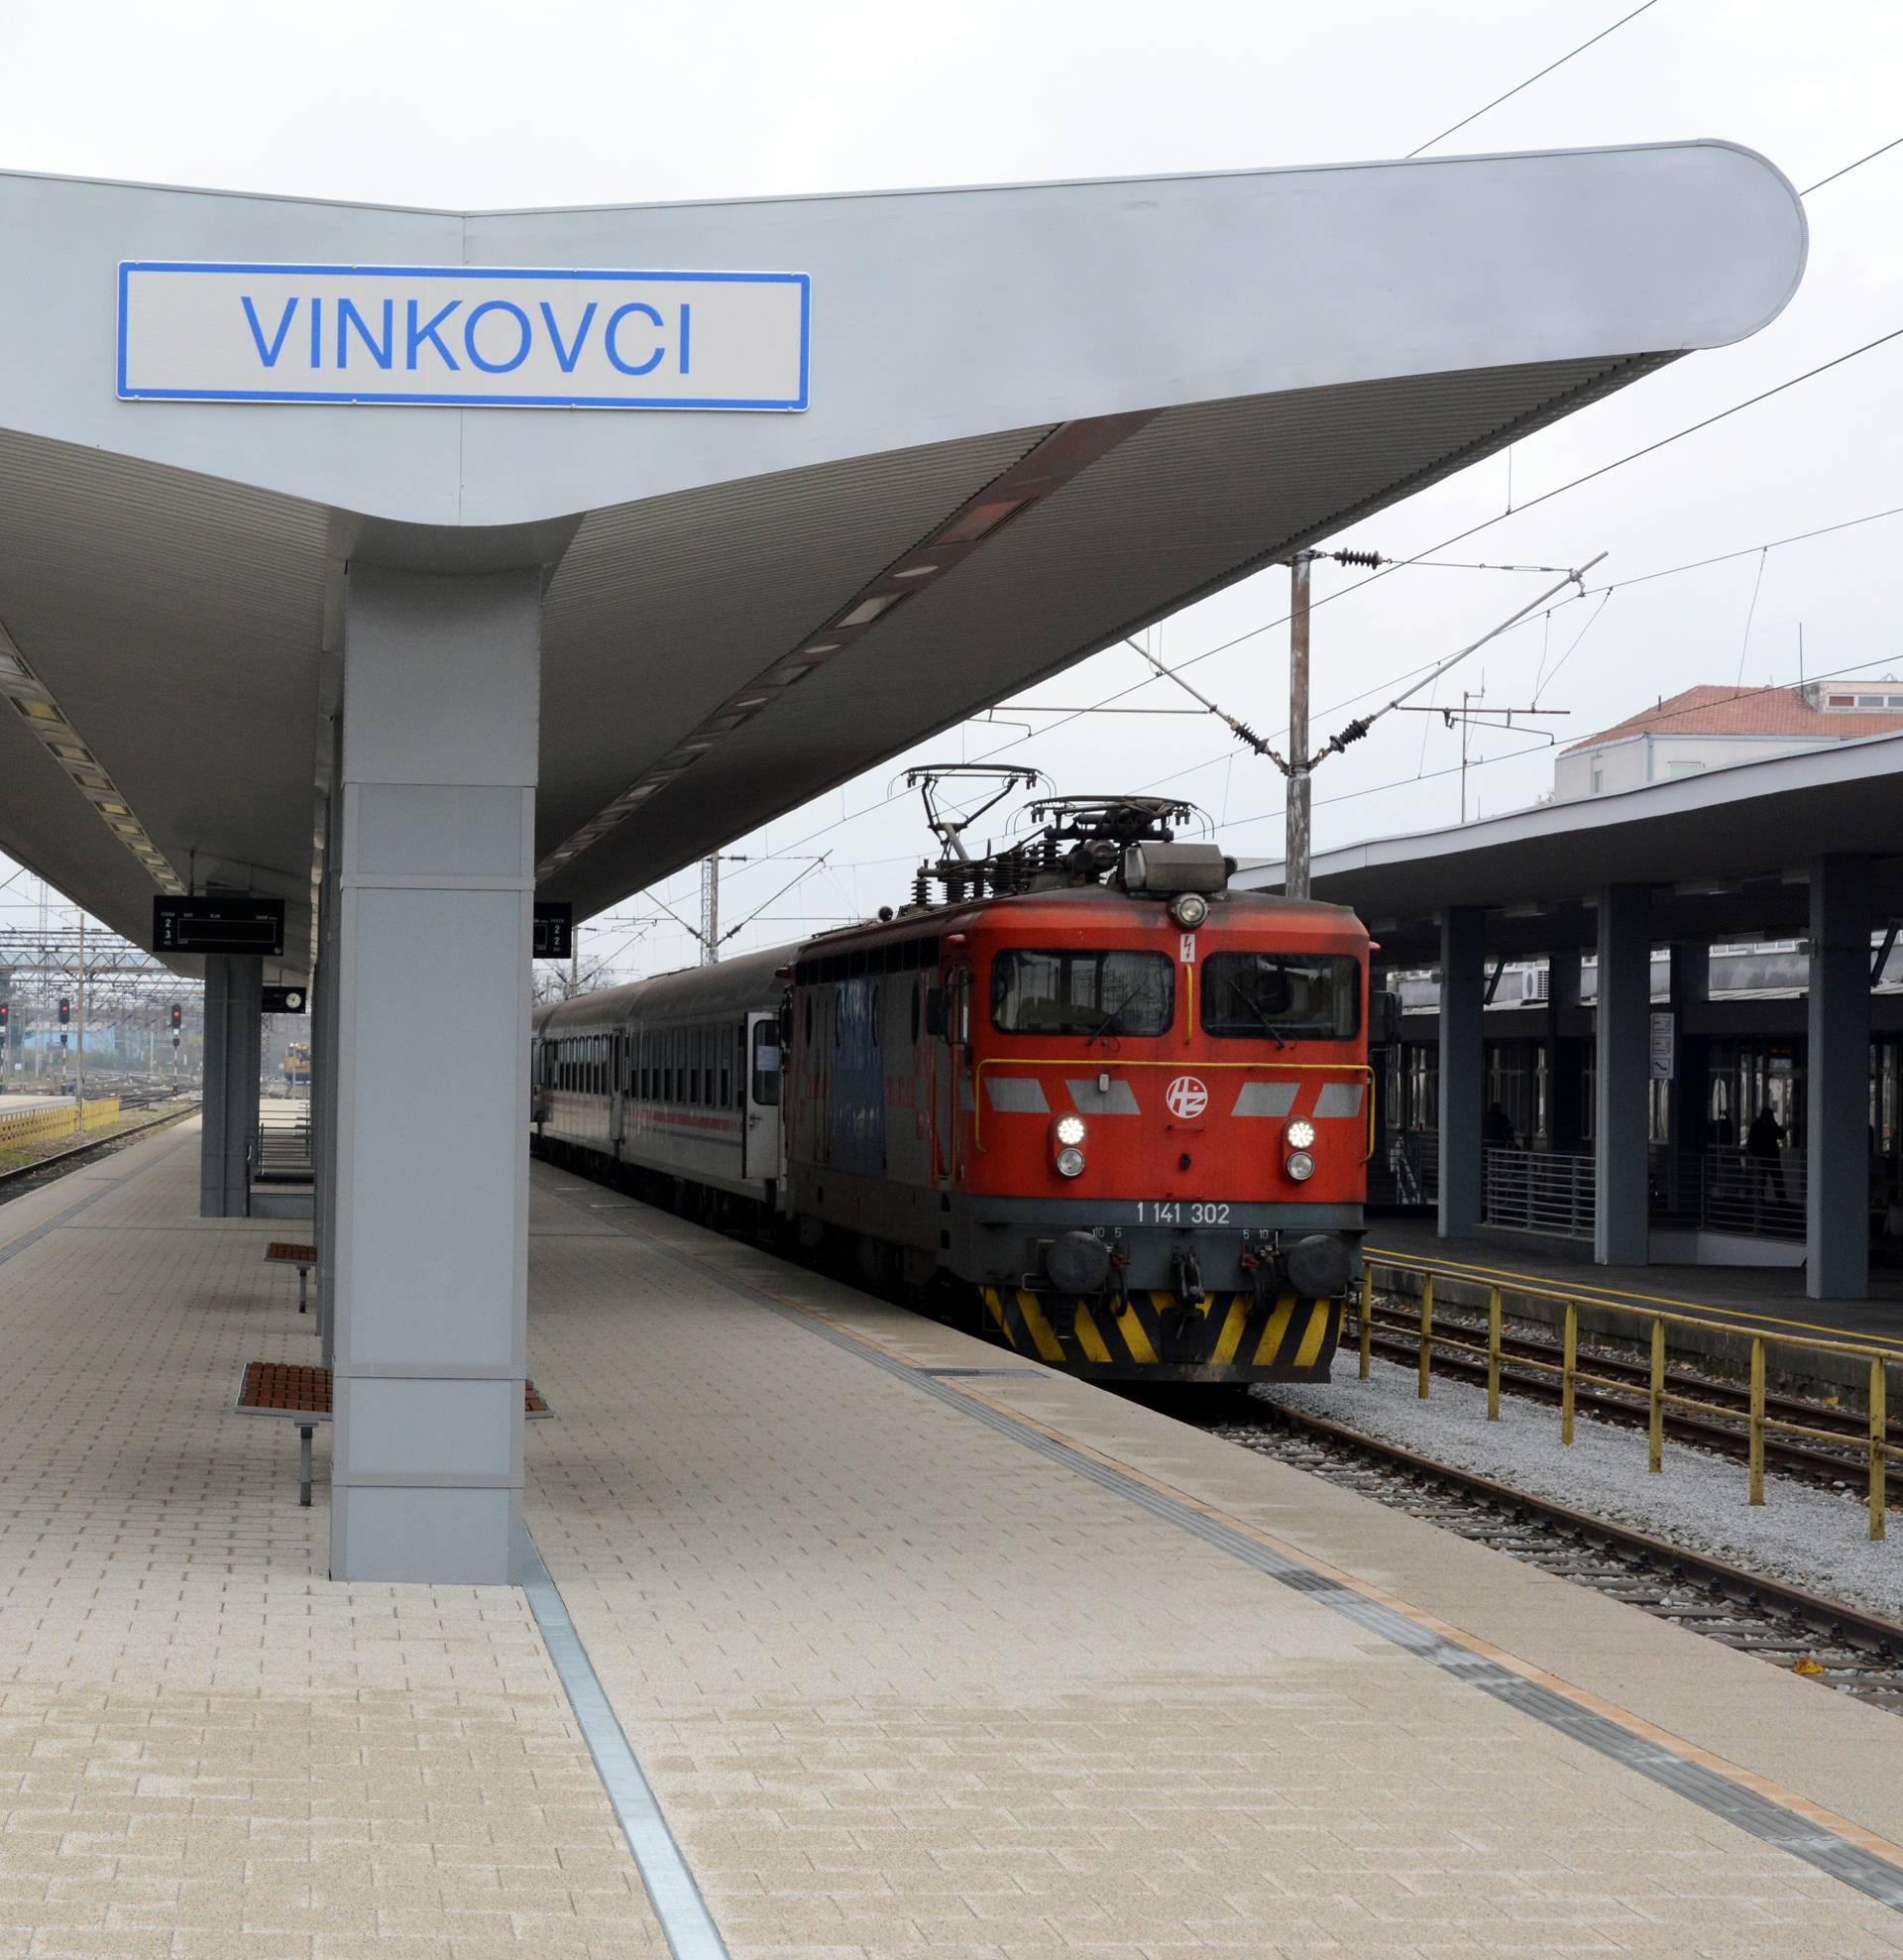 Hrvatske ceste izdvojile 16 mil. kn za obnovu vinkovačke ulice